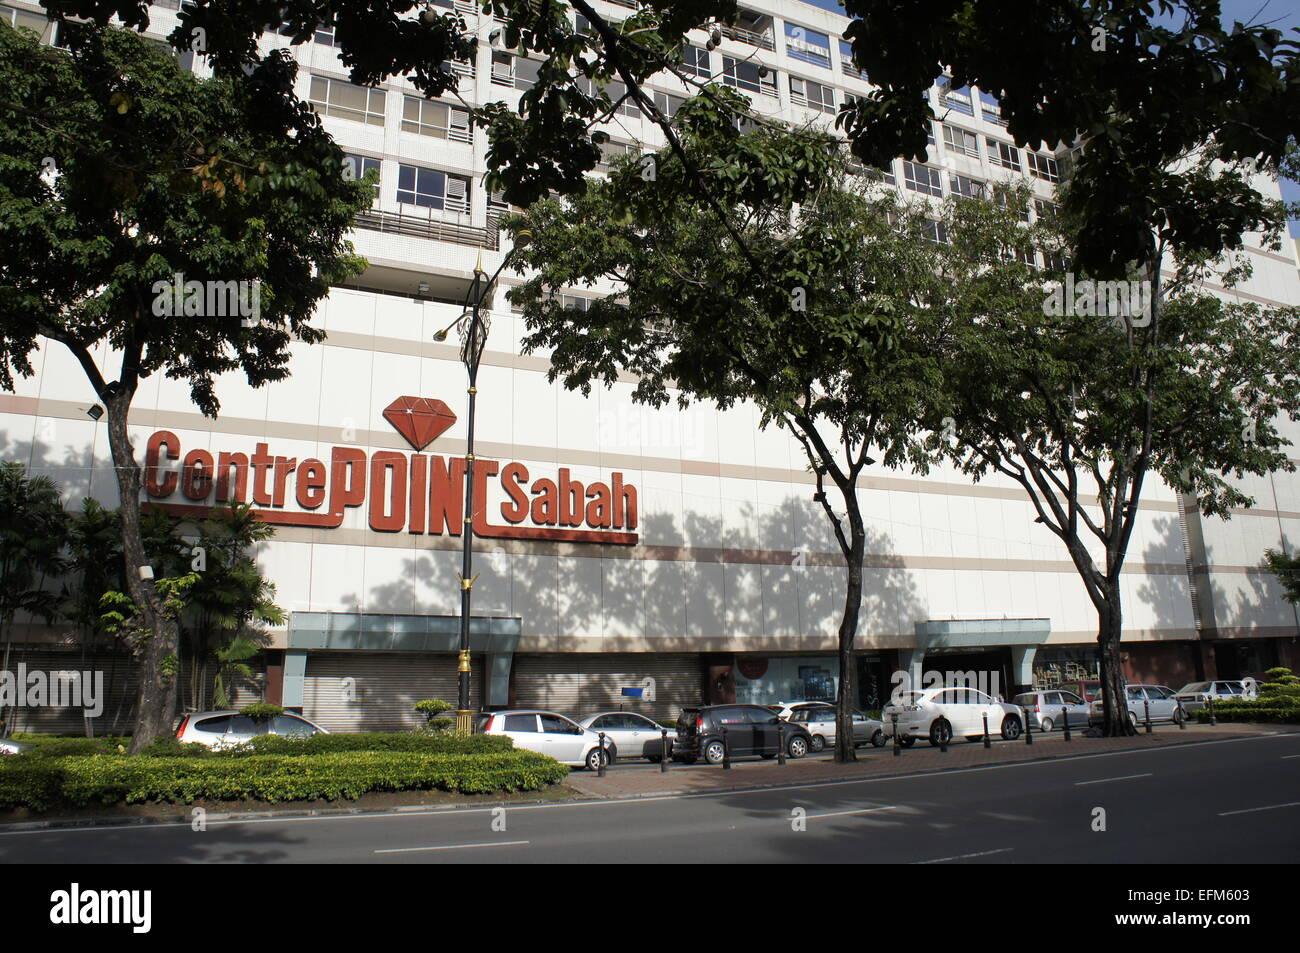 Centrepoint shopping centre in Kota Kinabalu, Sabah - Stock Image